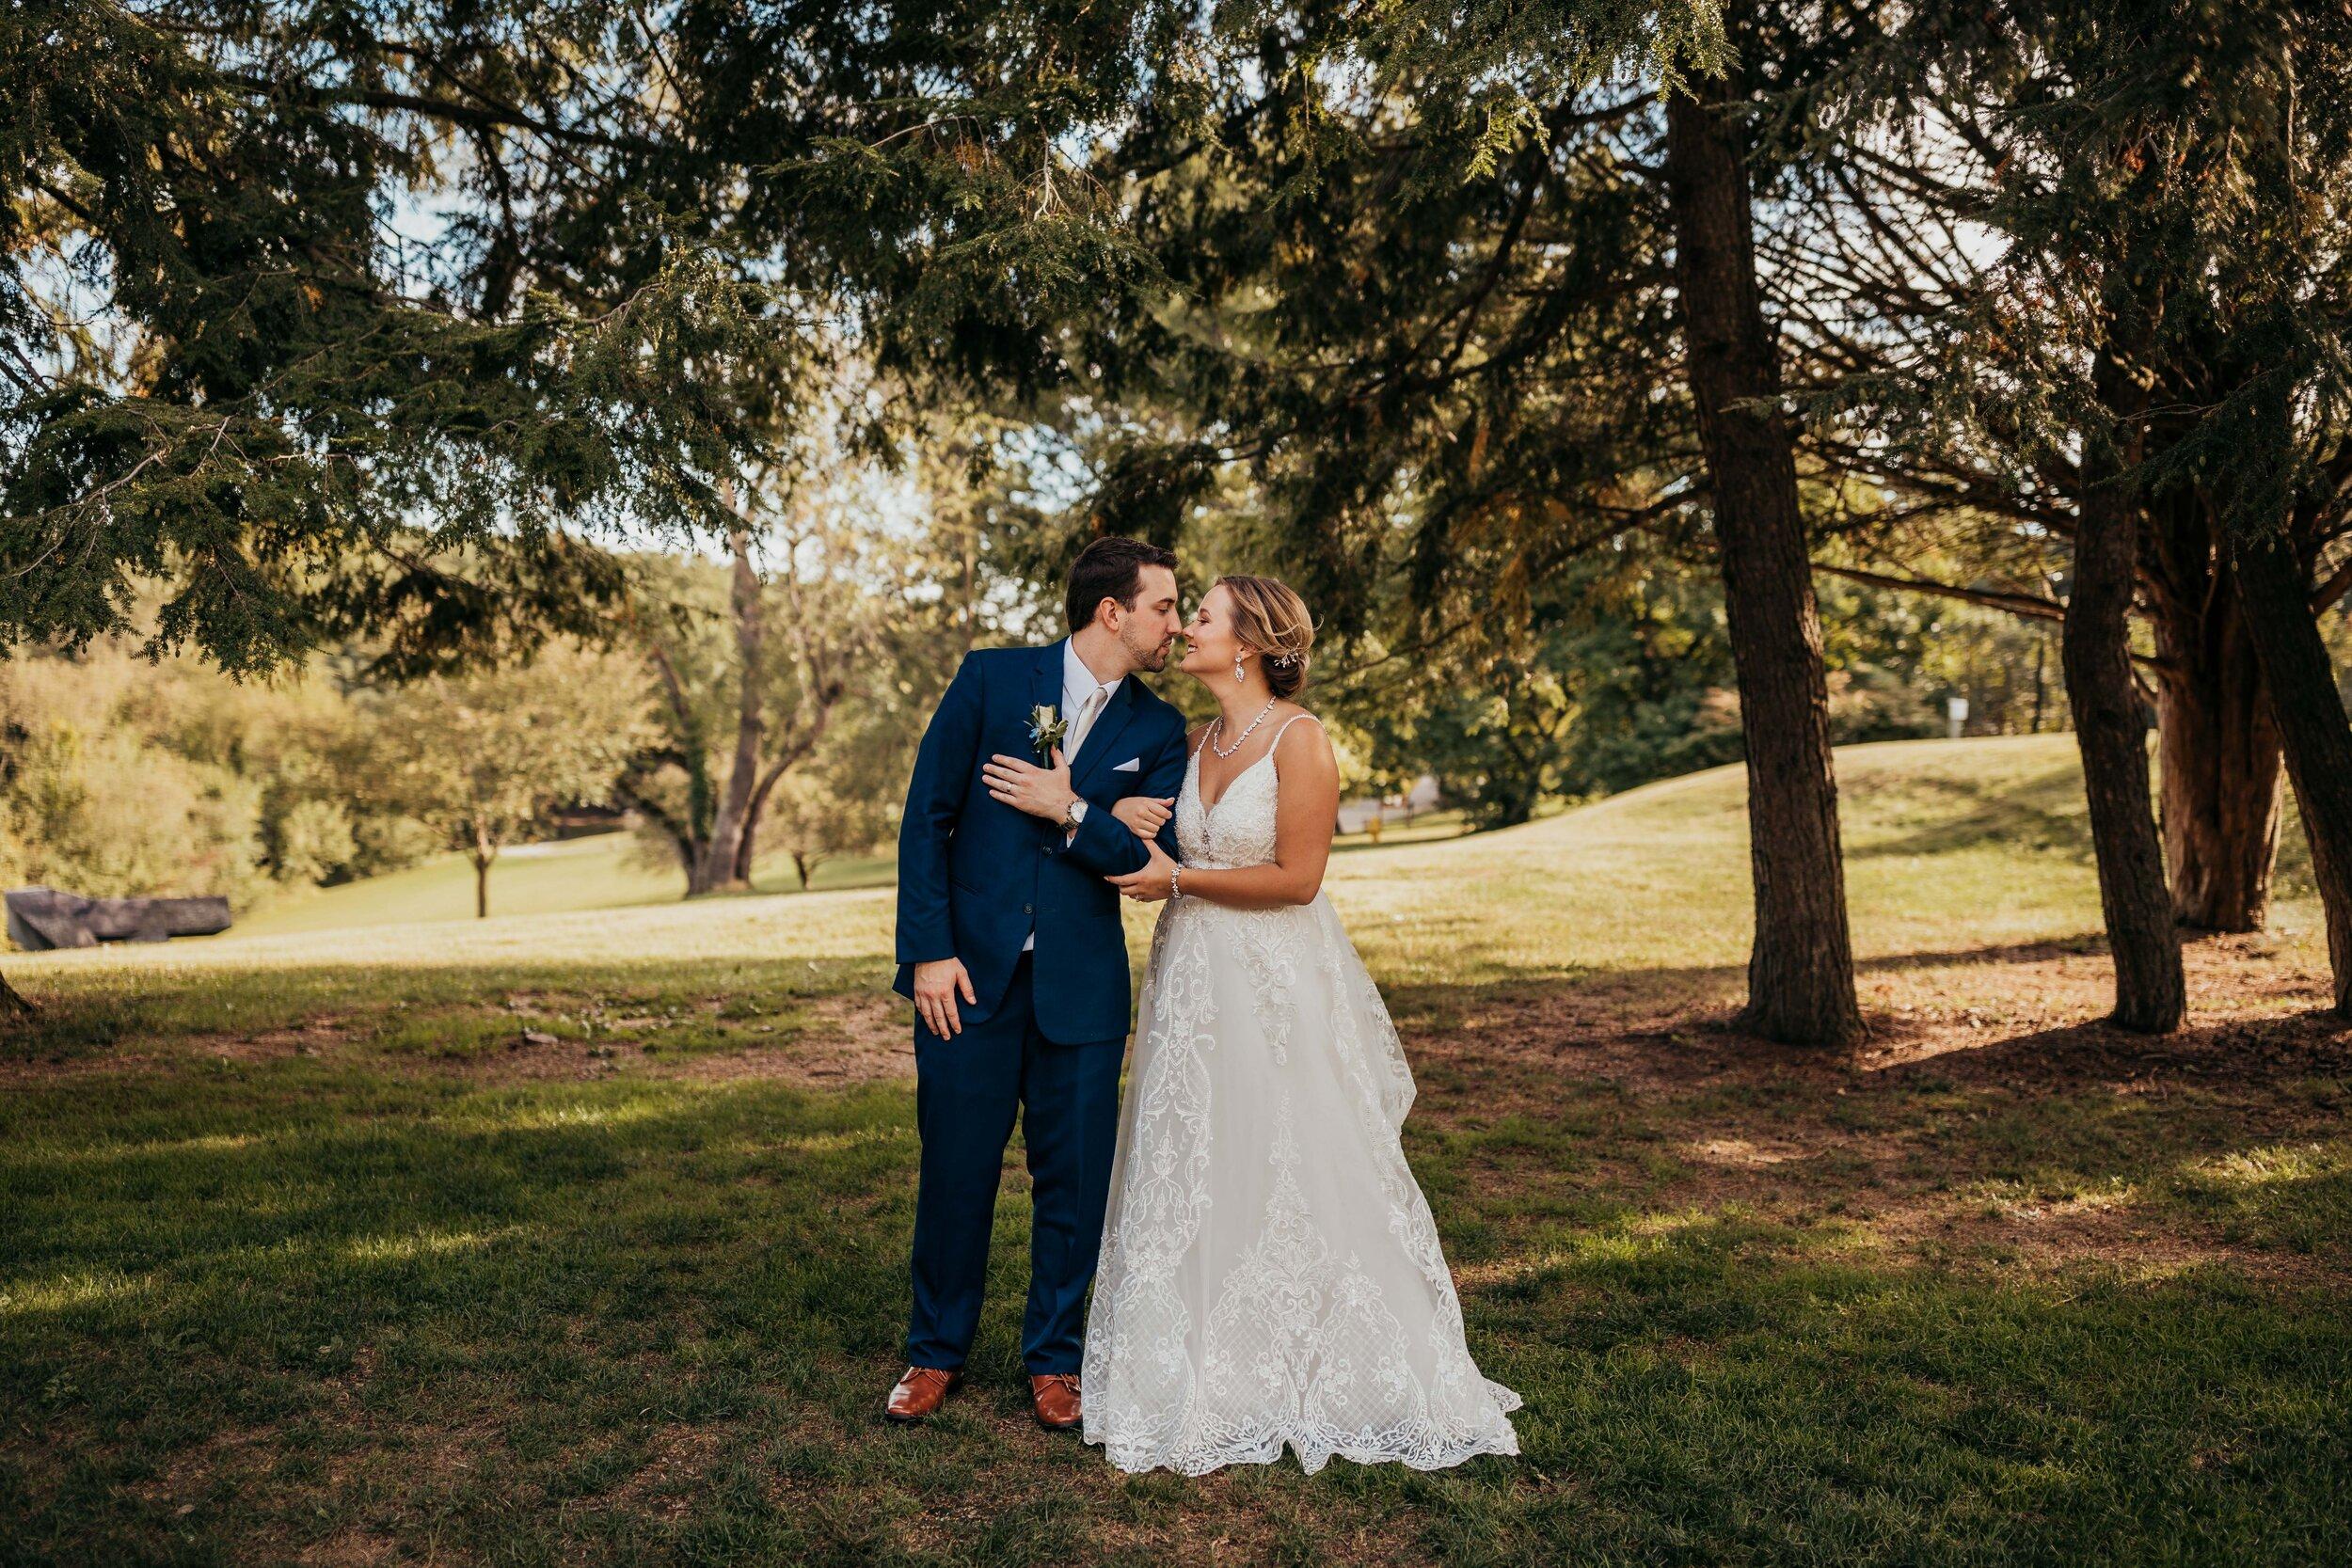 Pittsburgh wedding photography - Hartwood Acres Mansion wedding-1027.jpg